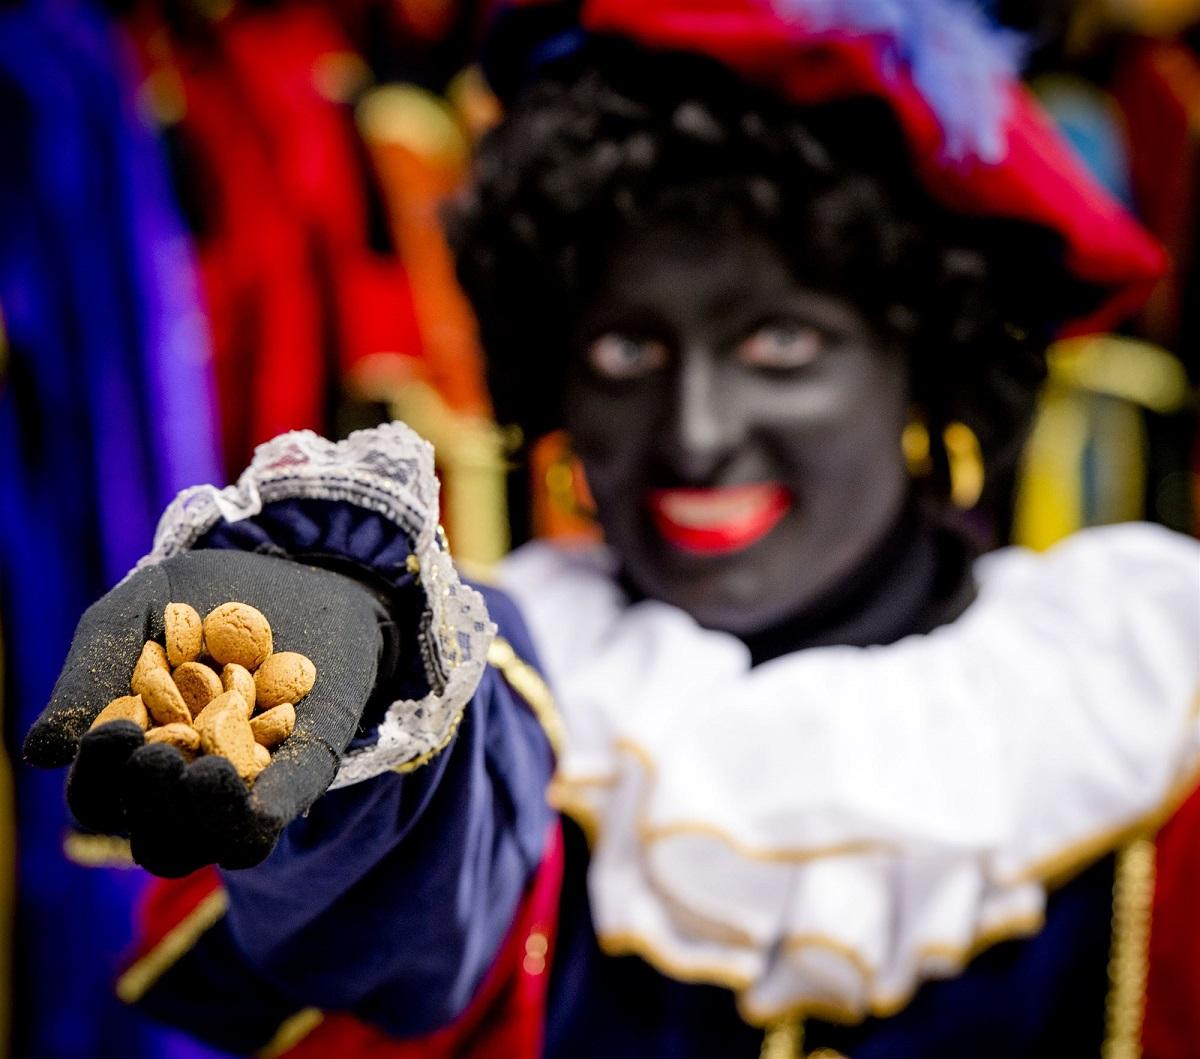 pepernoten-zwarte-piet